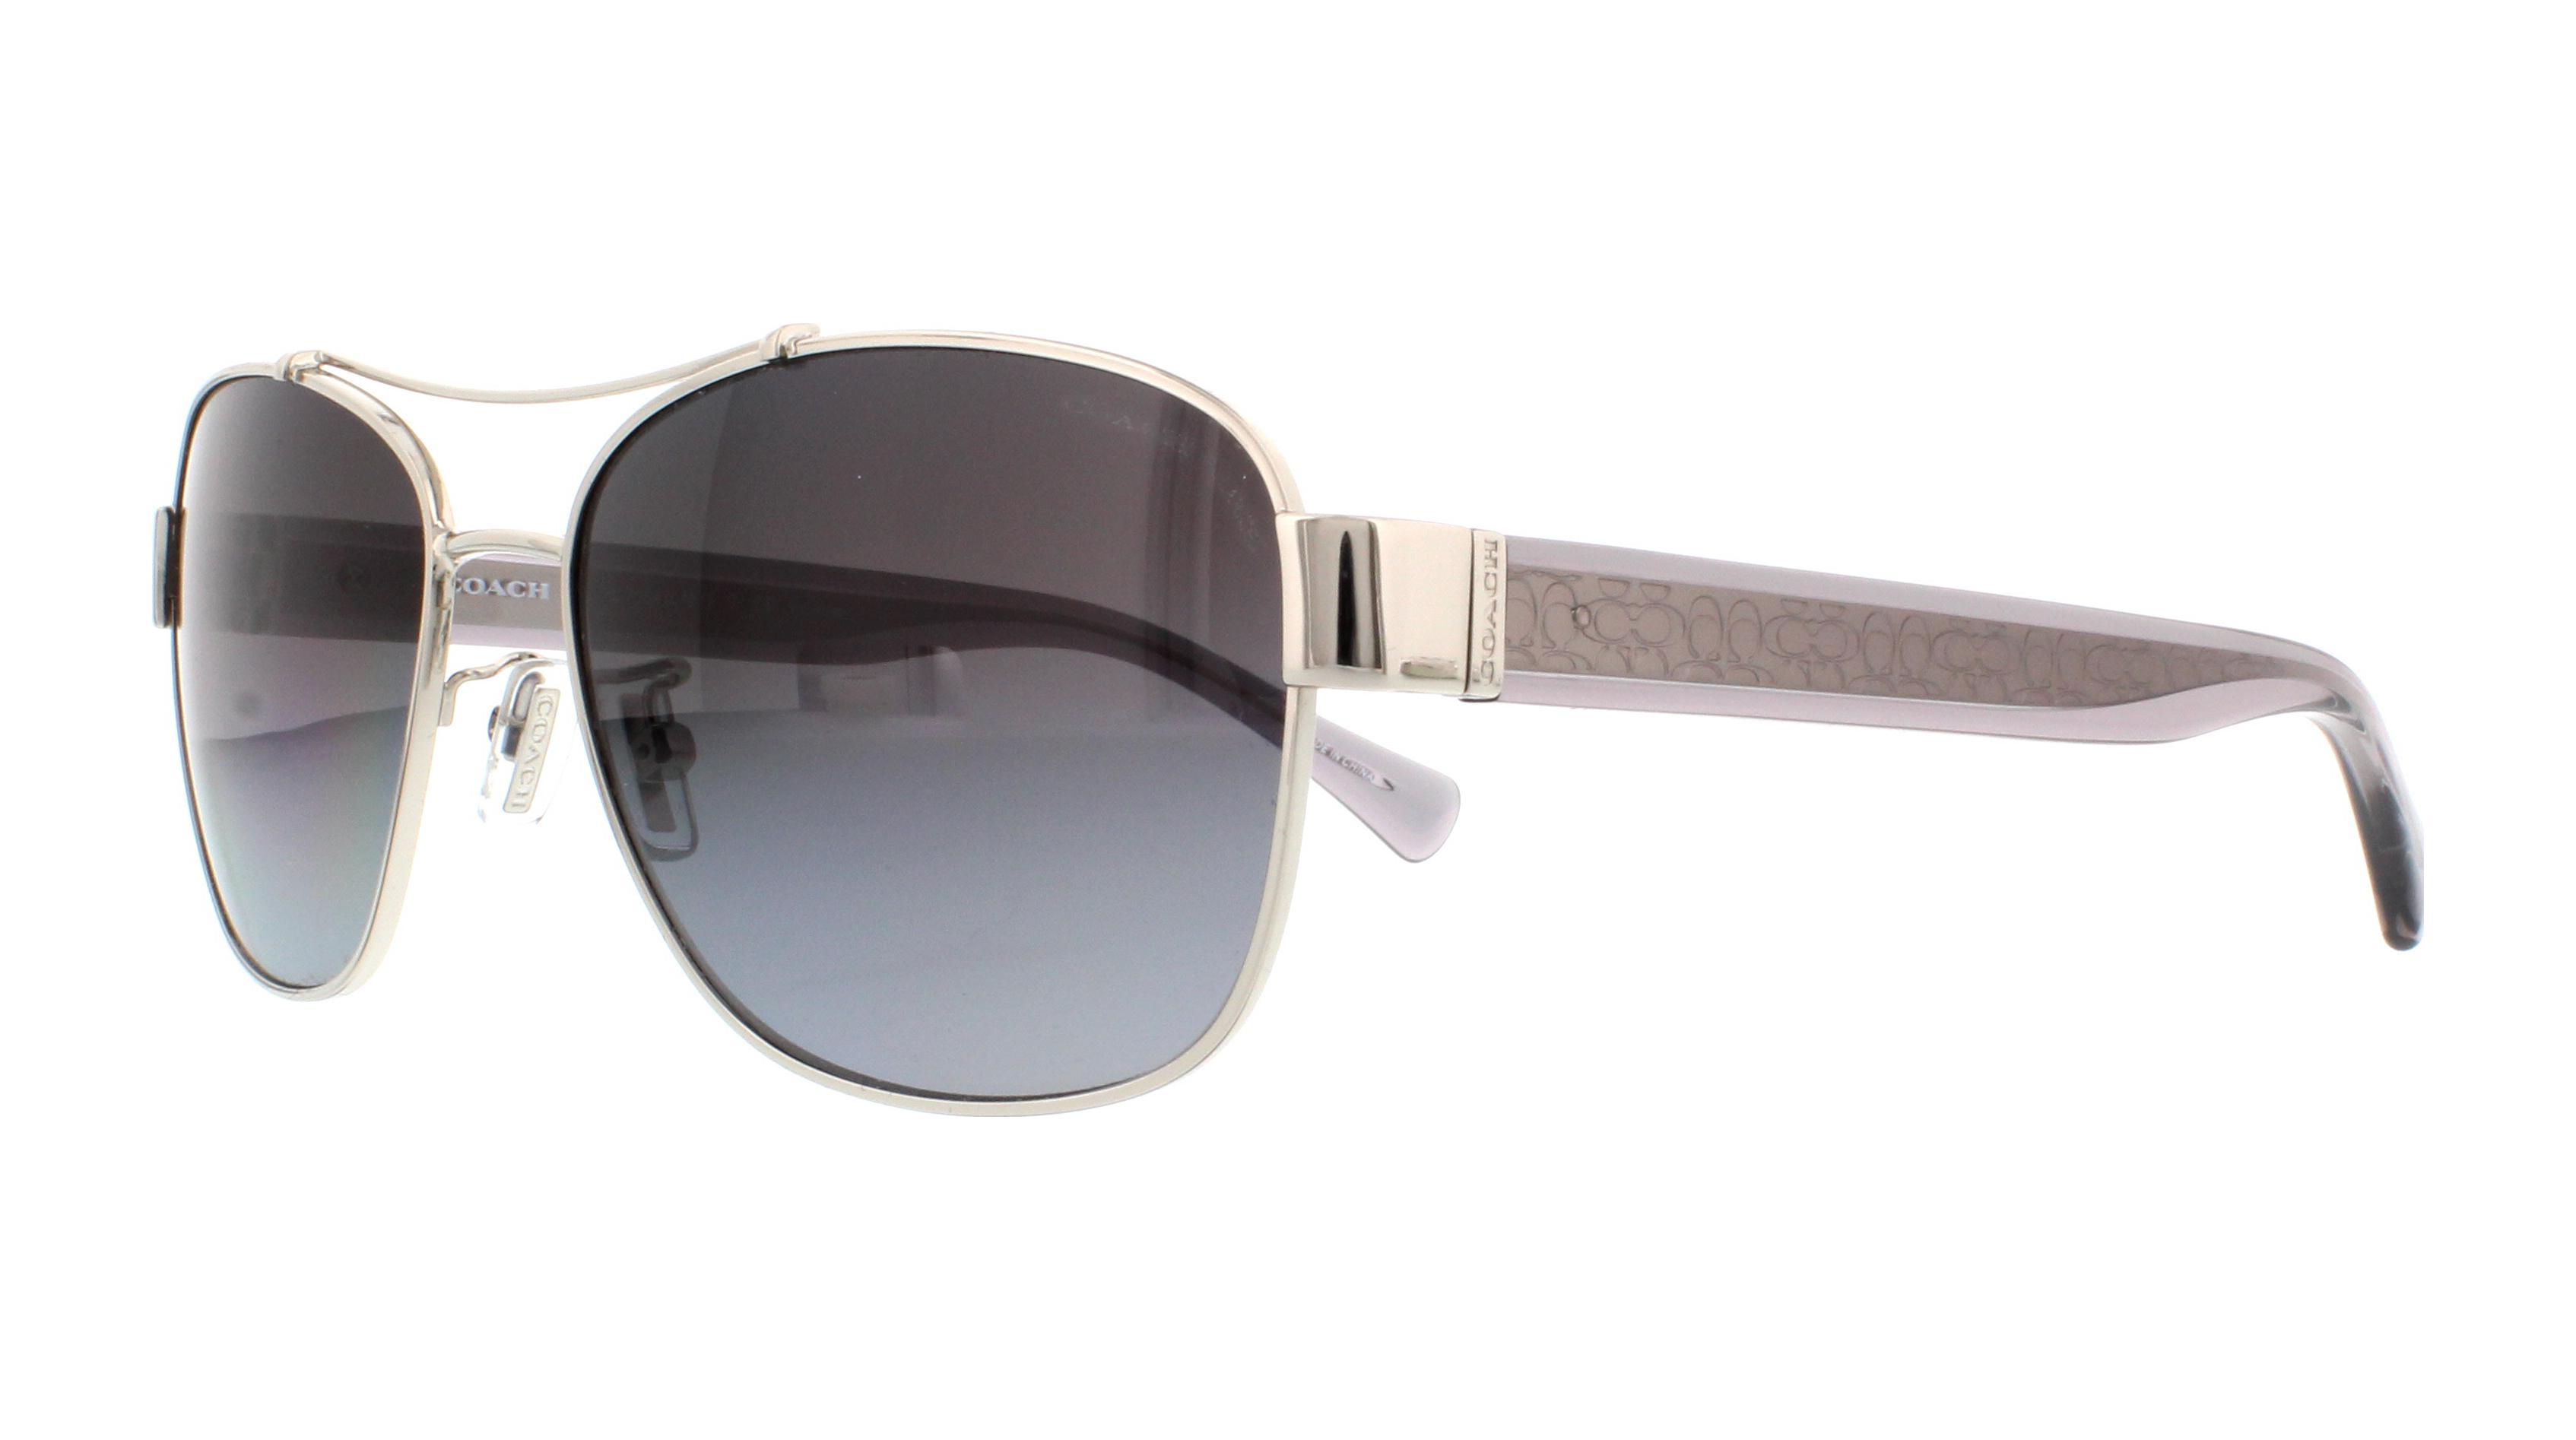 df7baea0f2 ... germany picture of coach sunglasses hc7064 l151 3612a 61bbe ireland  coach hc7064 sunglasses silver ...